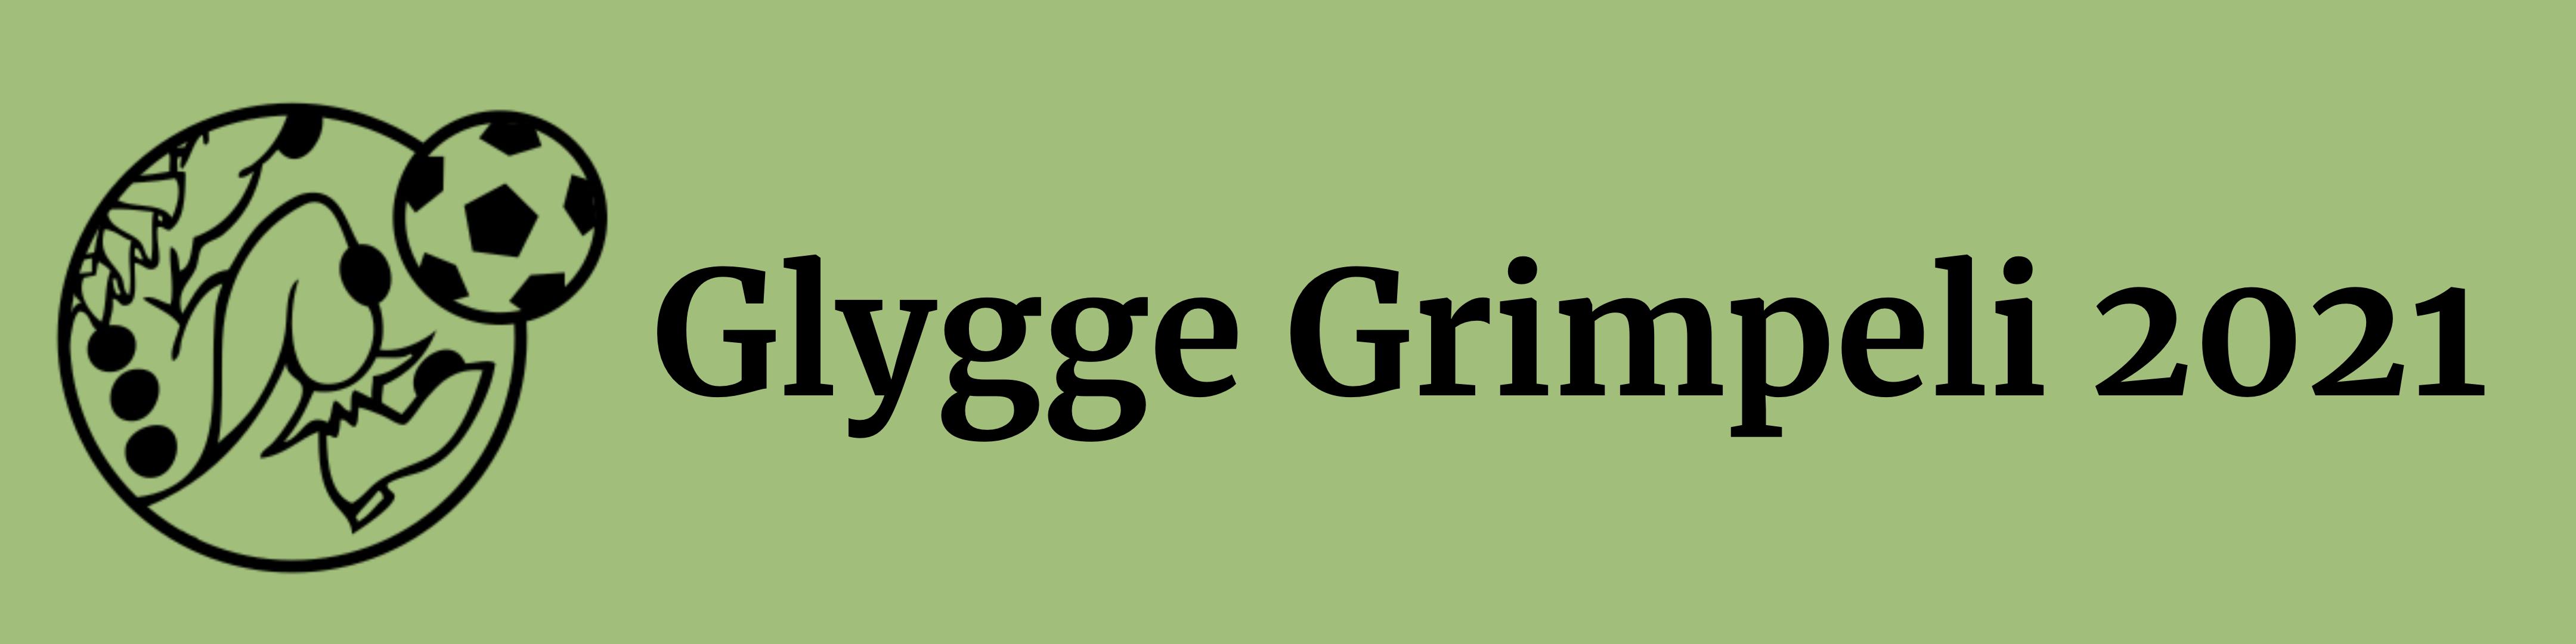 Glygge Grimpeli 2021